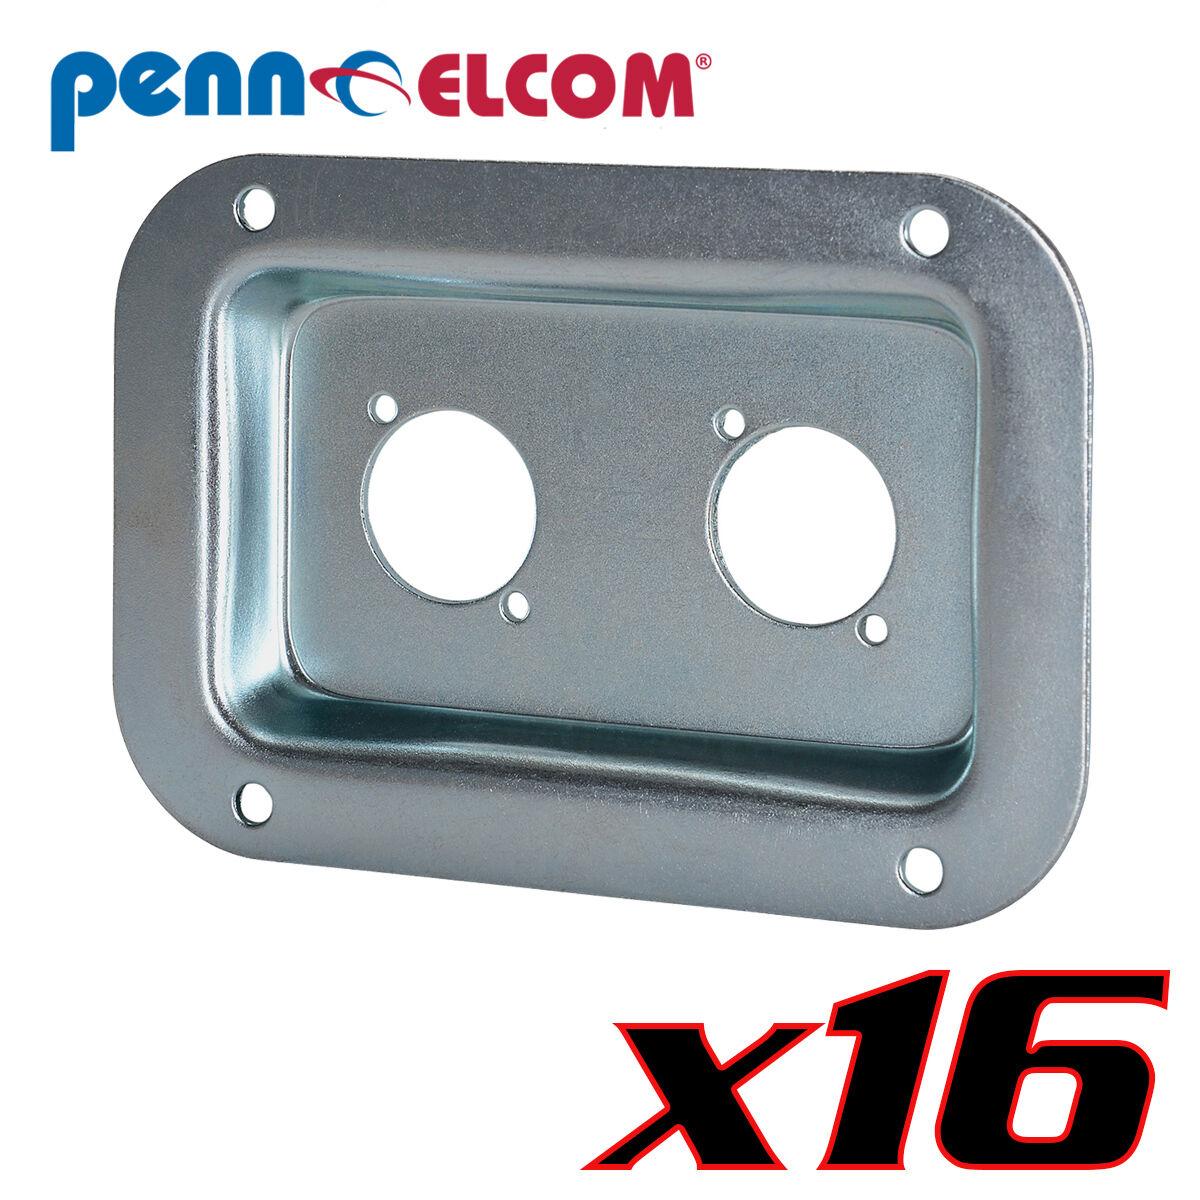 16 Penn Elcom D0604Z Dish 2 Neutrik D Speakon NL2 NL4 PennBrite 3-1 2  x 5-1 8